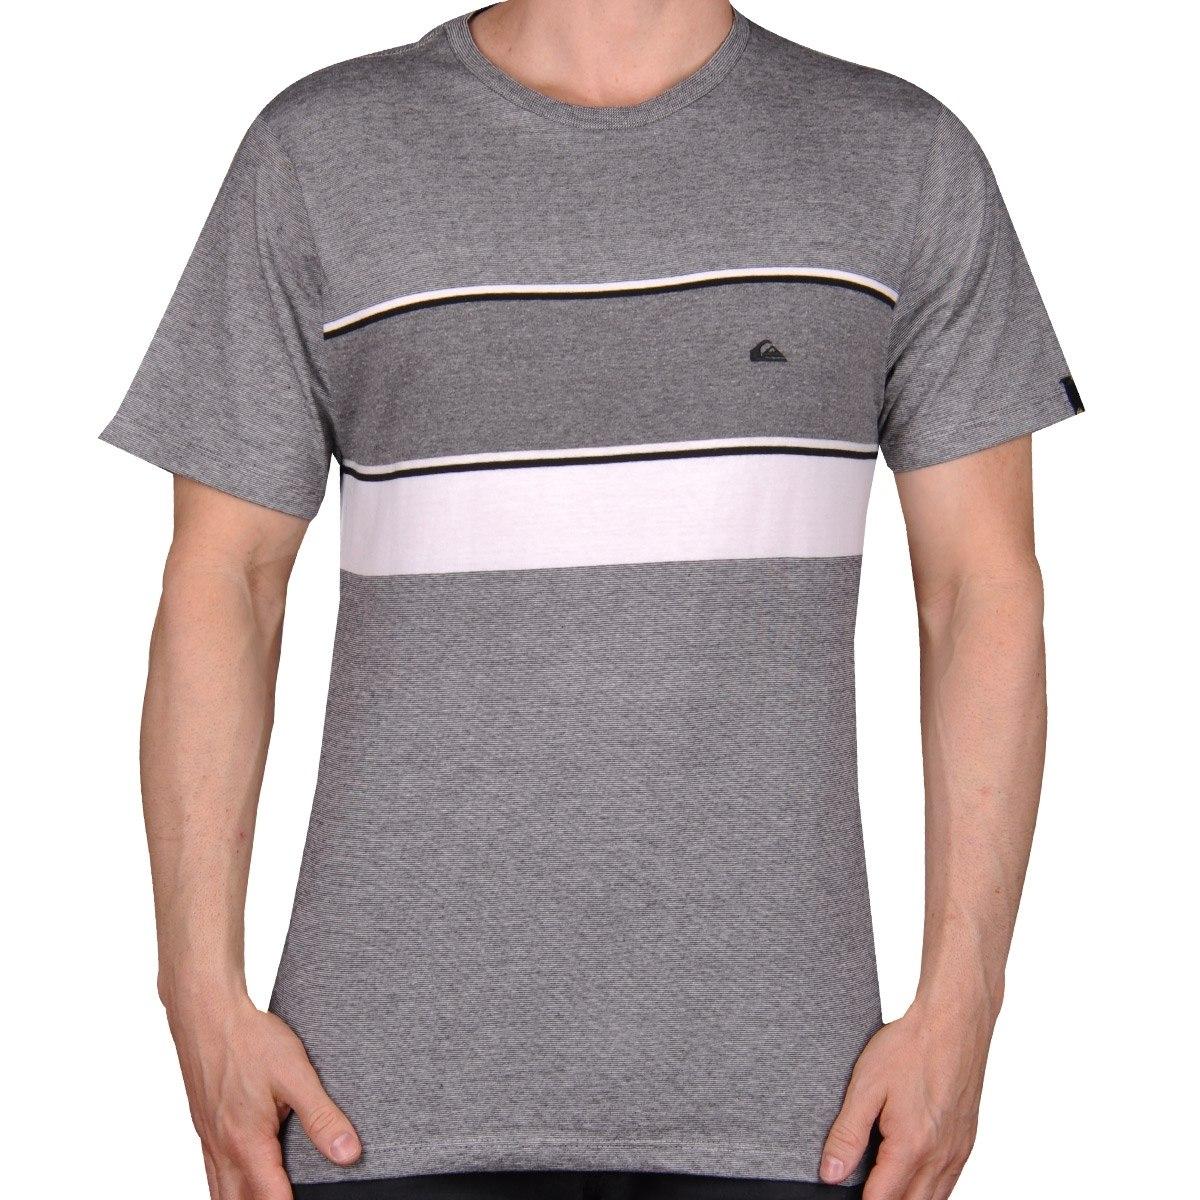 Camiseta Quiksilver Wolf Preto - Cut Wave - R  49 e3fb5ae6487